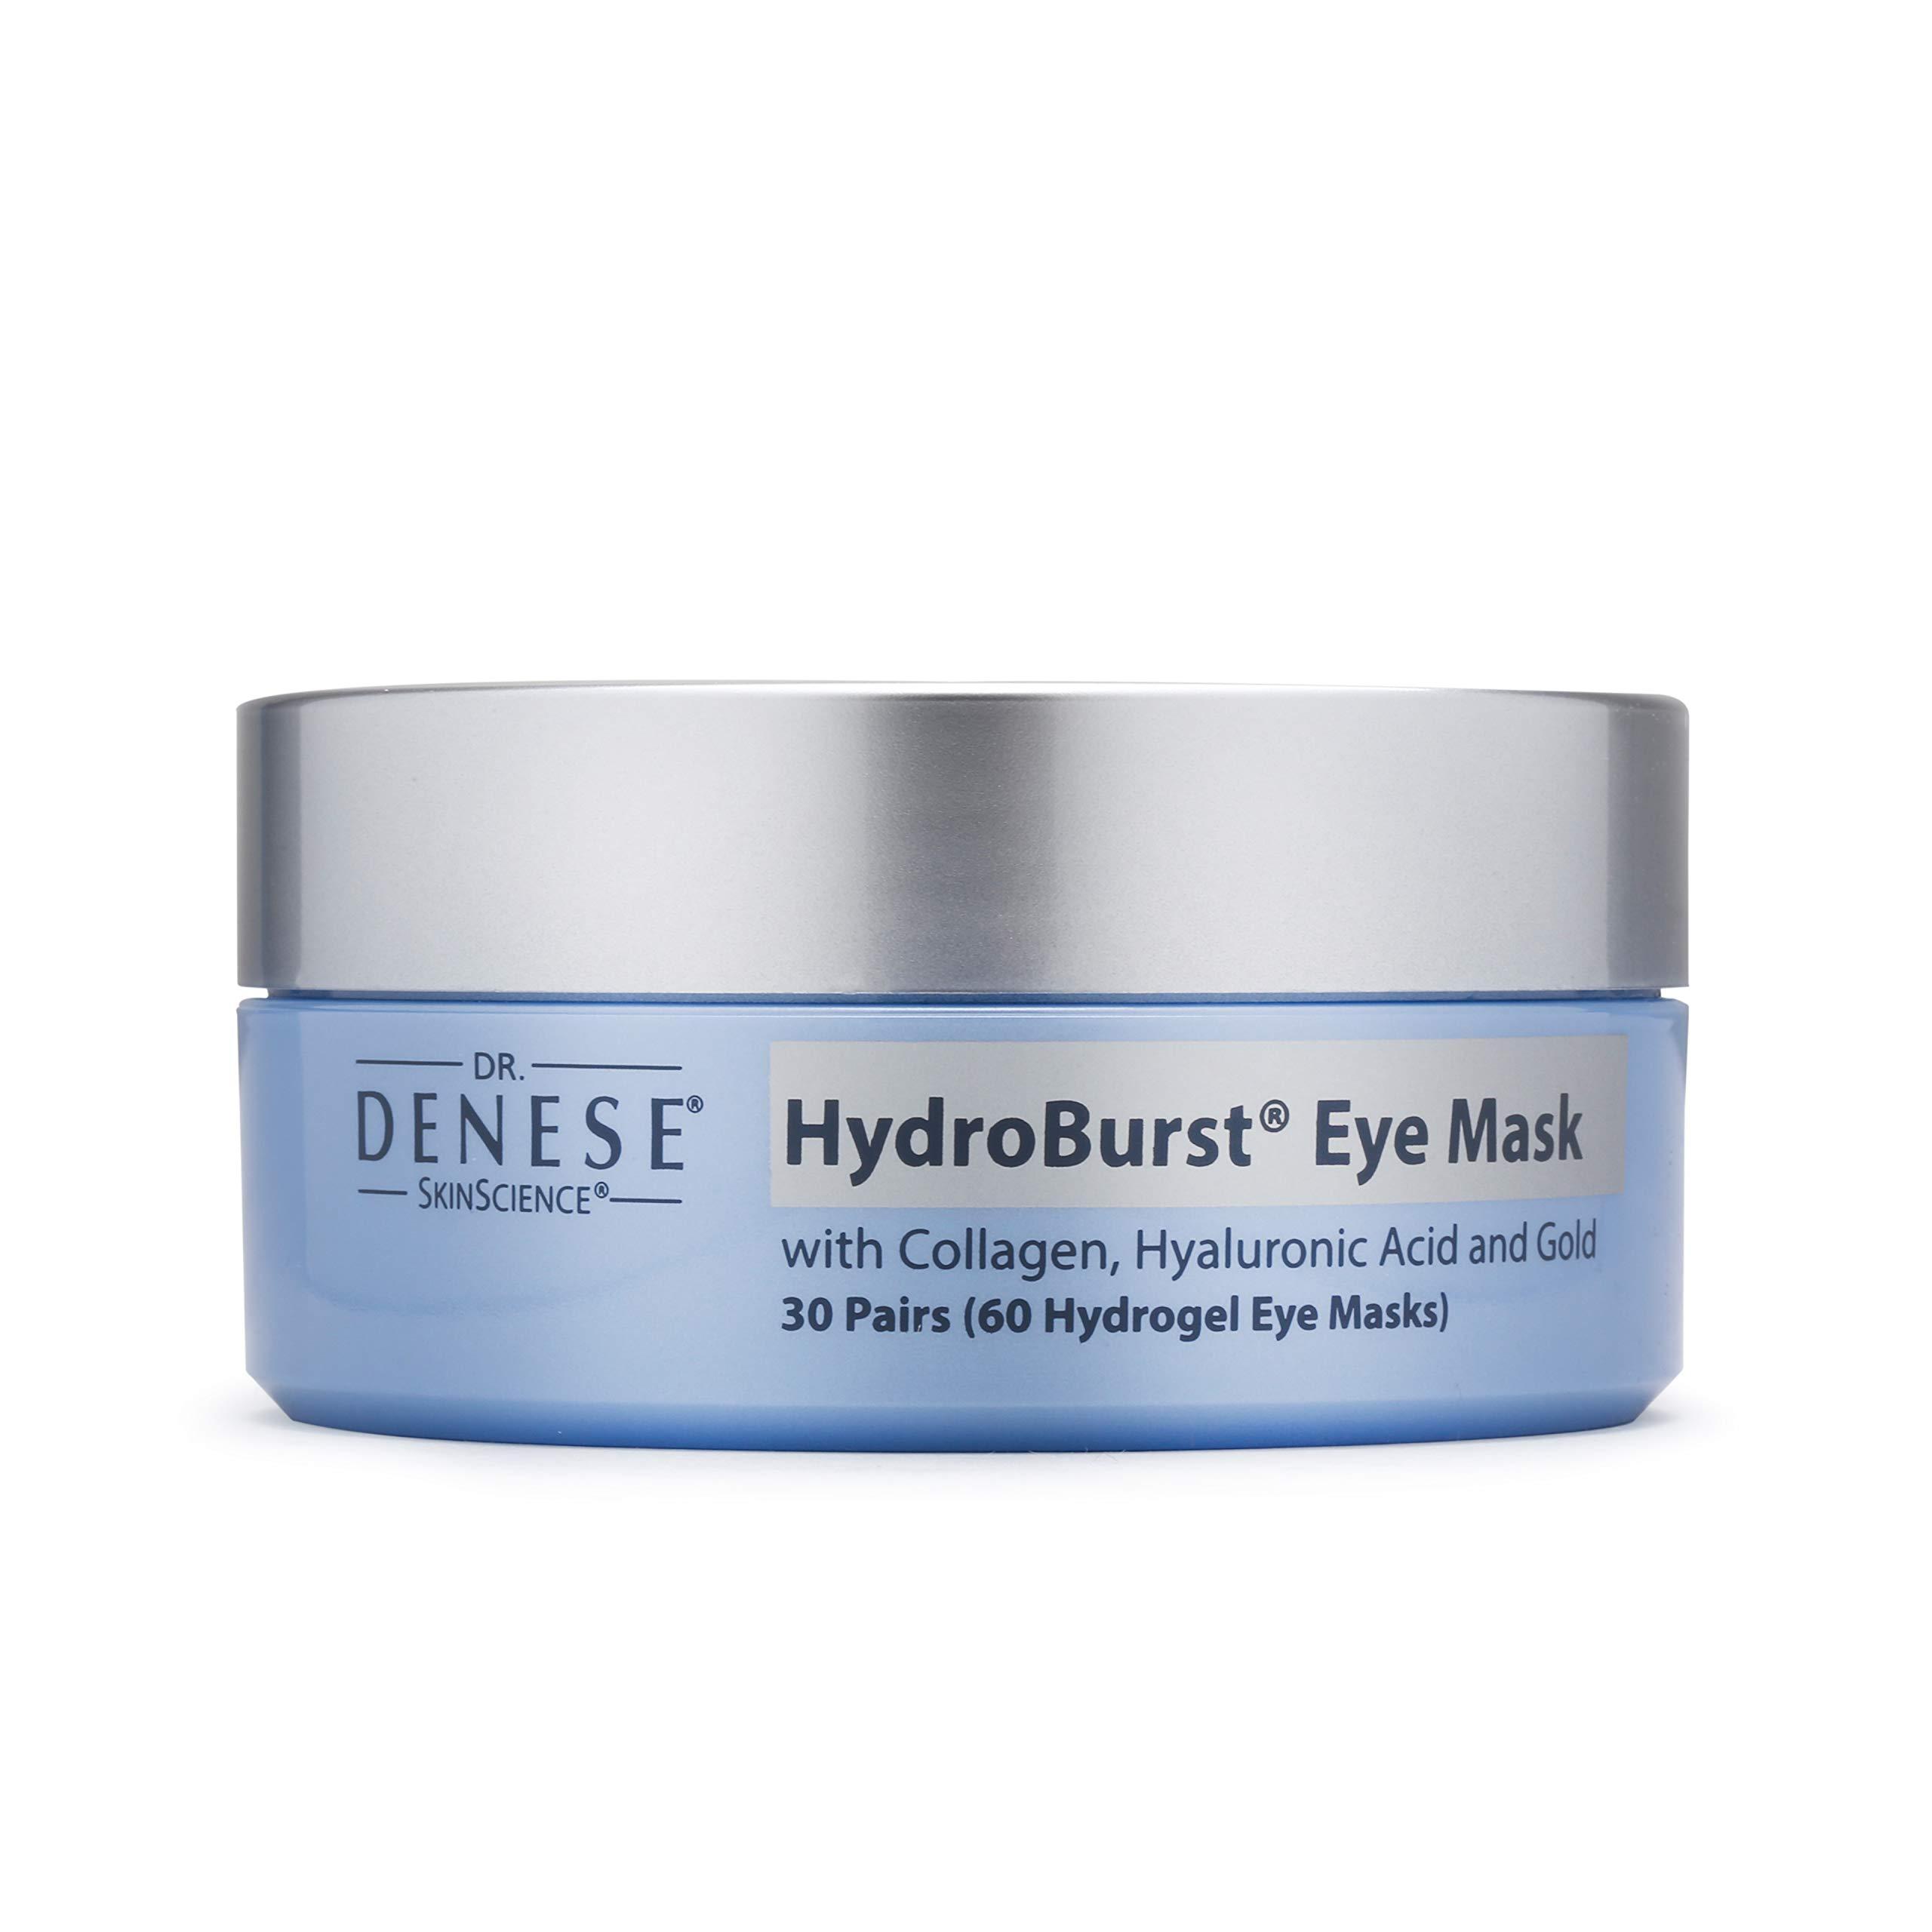 Dr. Denese The HydroBurst Eye Gel Mask by Dr. Denese